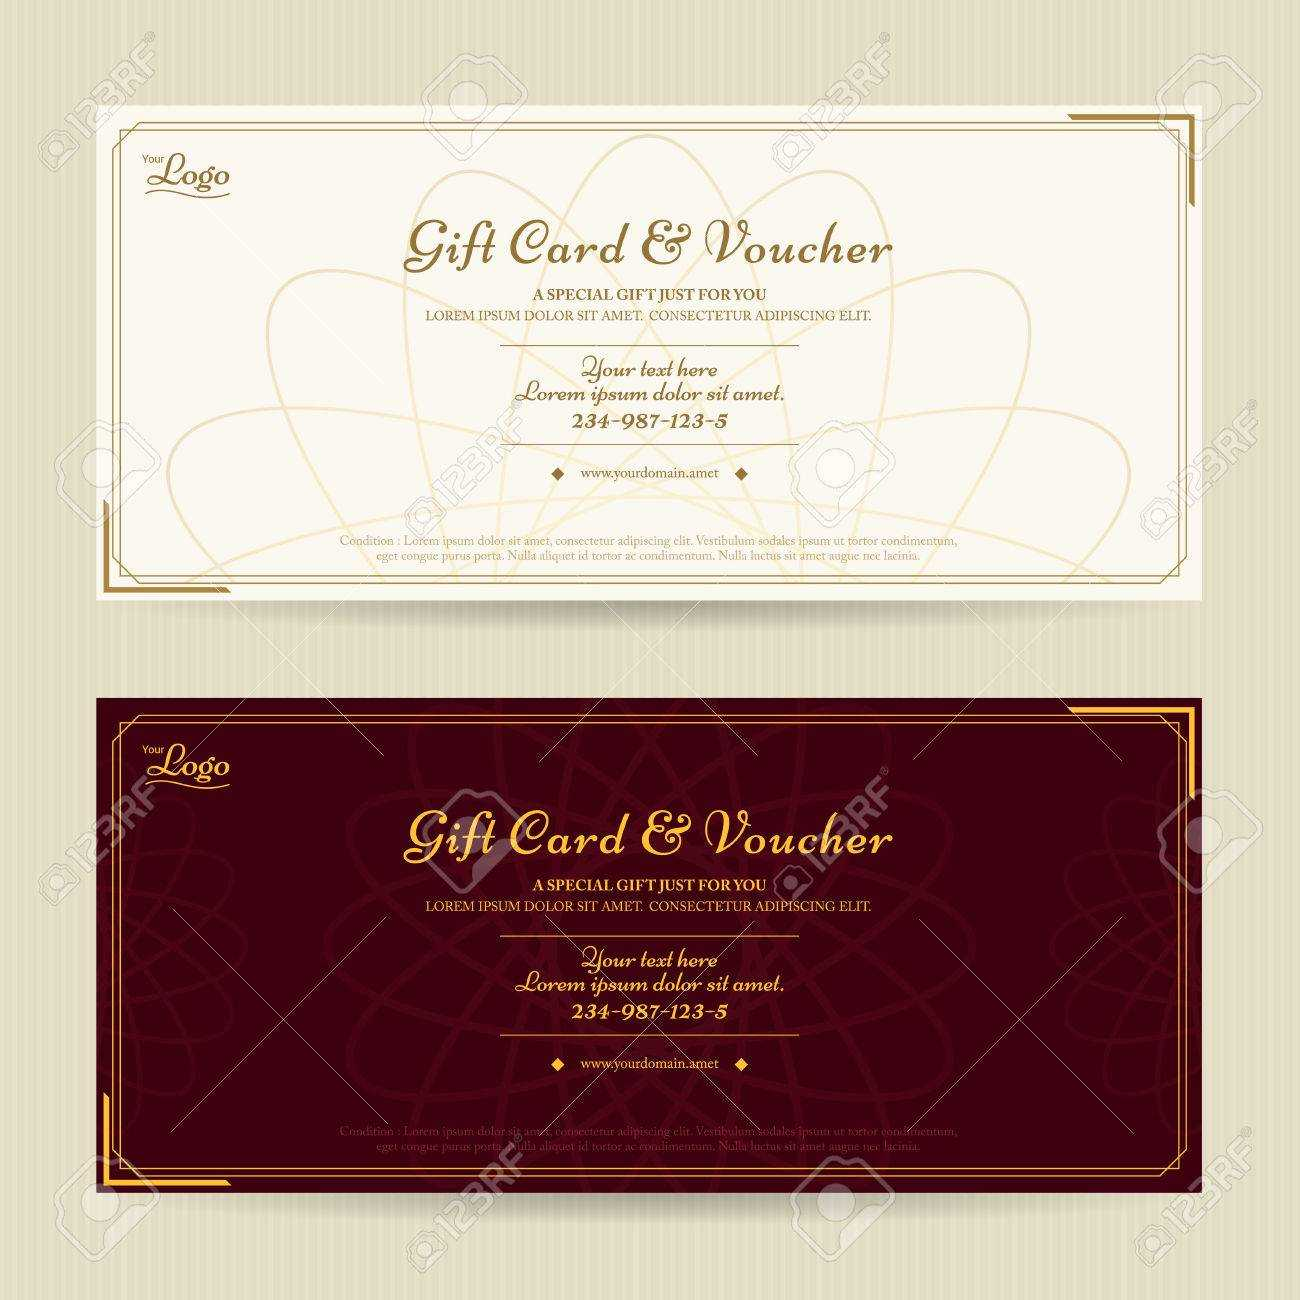 Elegant Gift Voucher Or Gift Card Template With Gold Border Regarding Elegant Gift Certificate Template